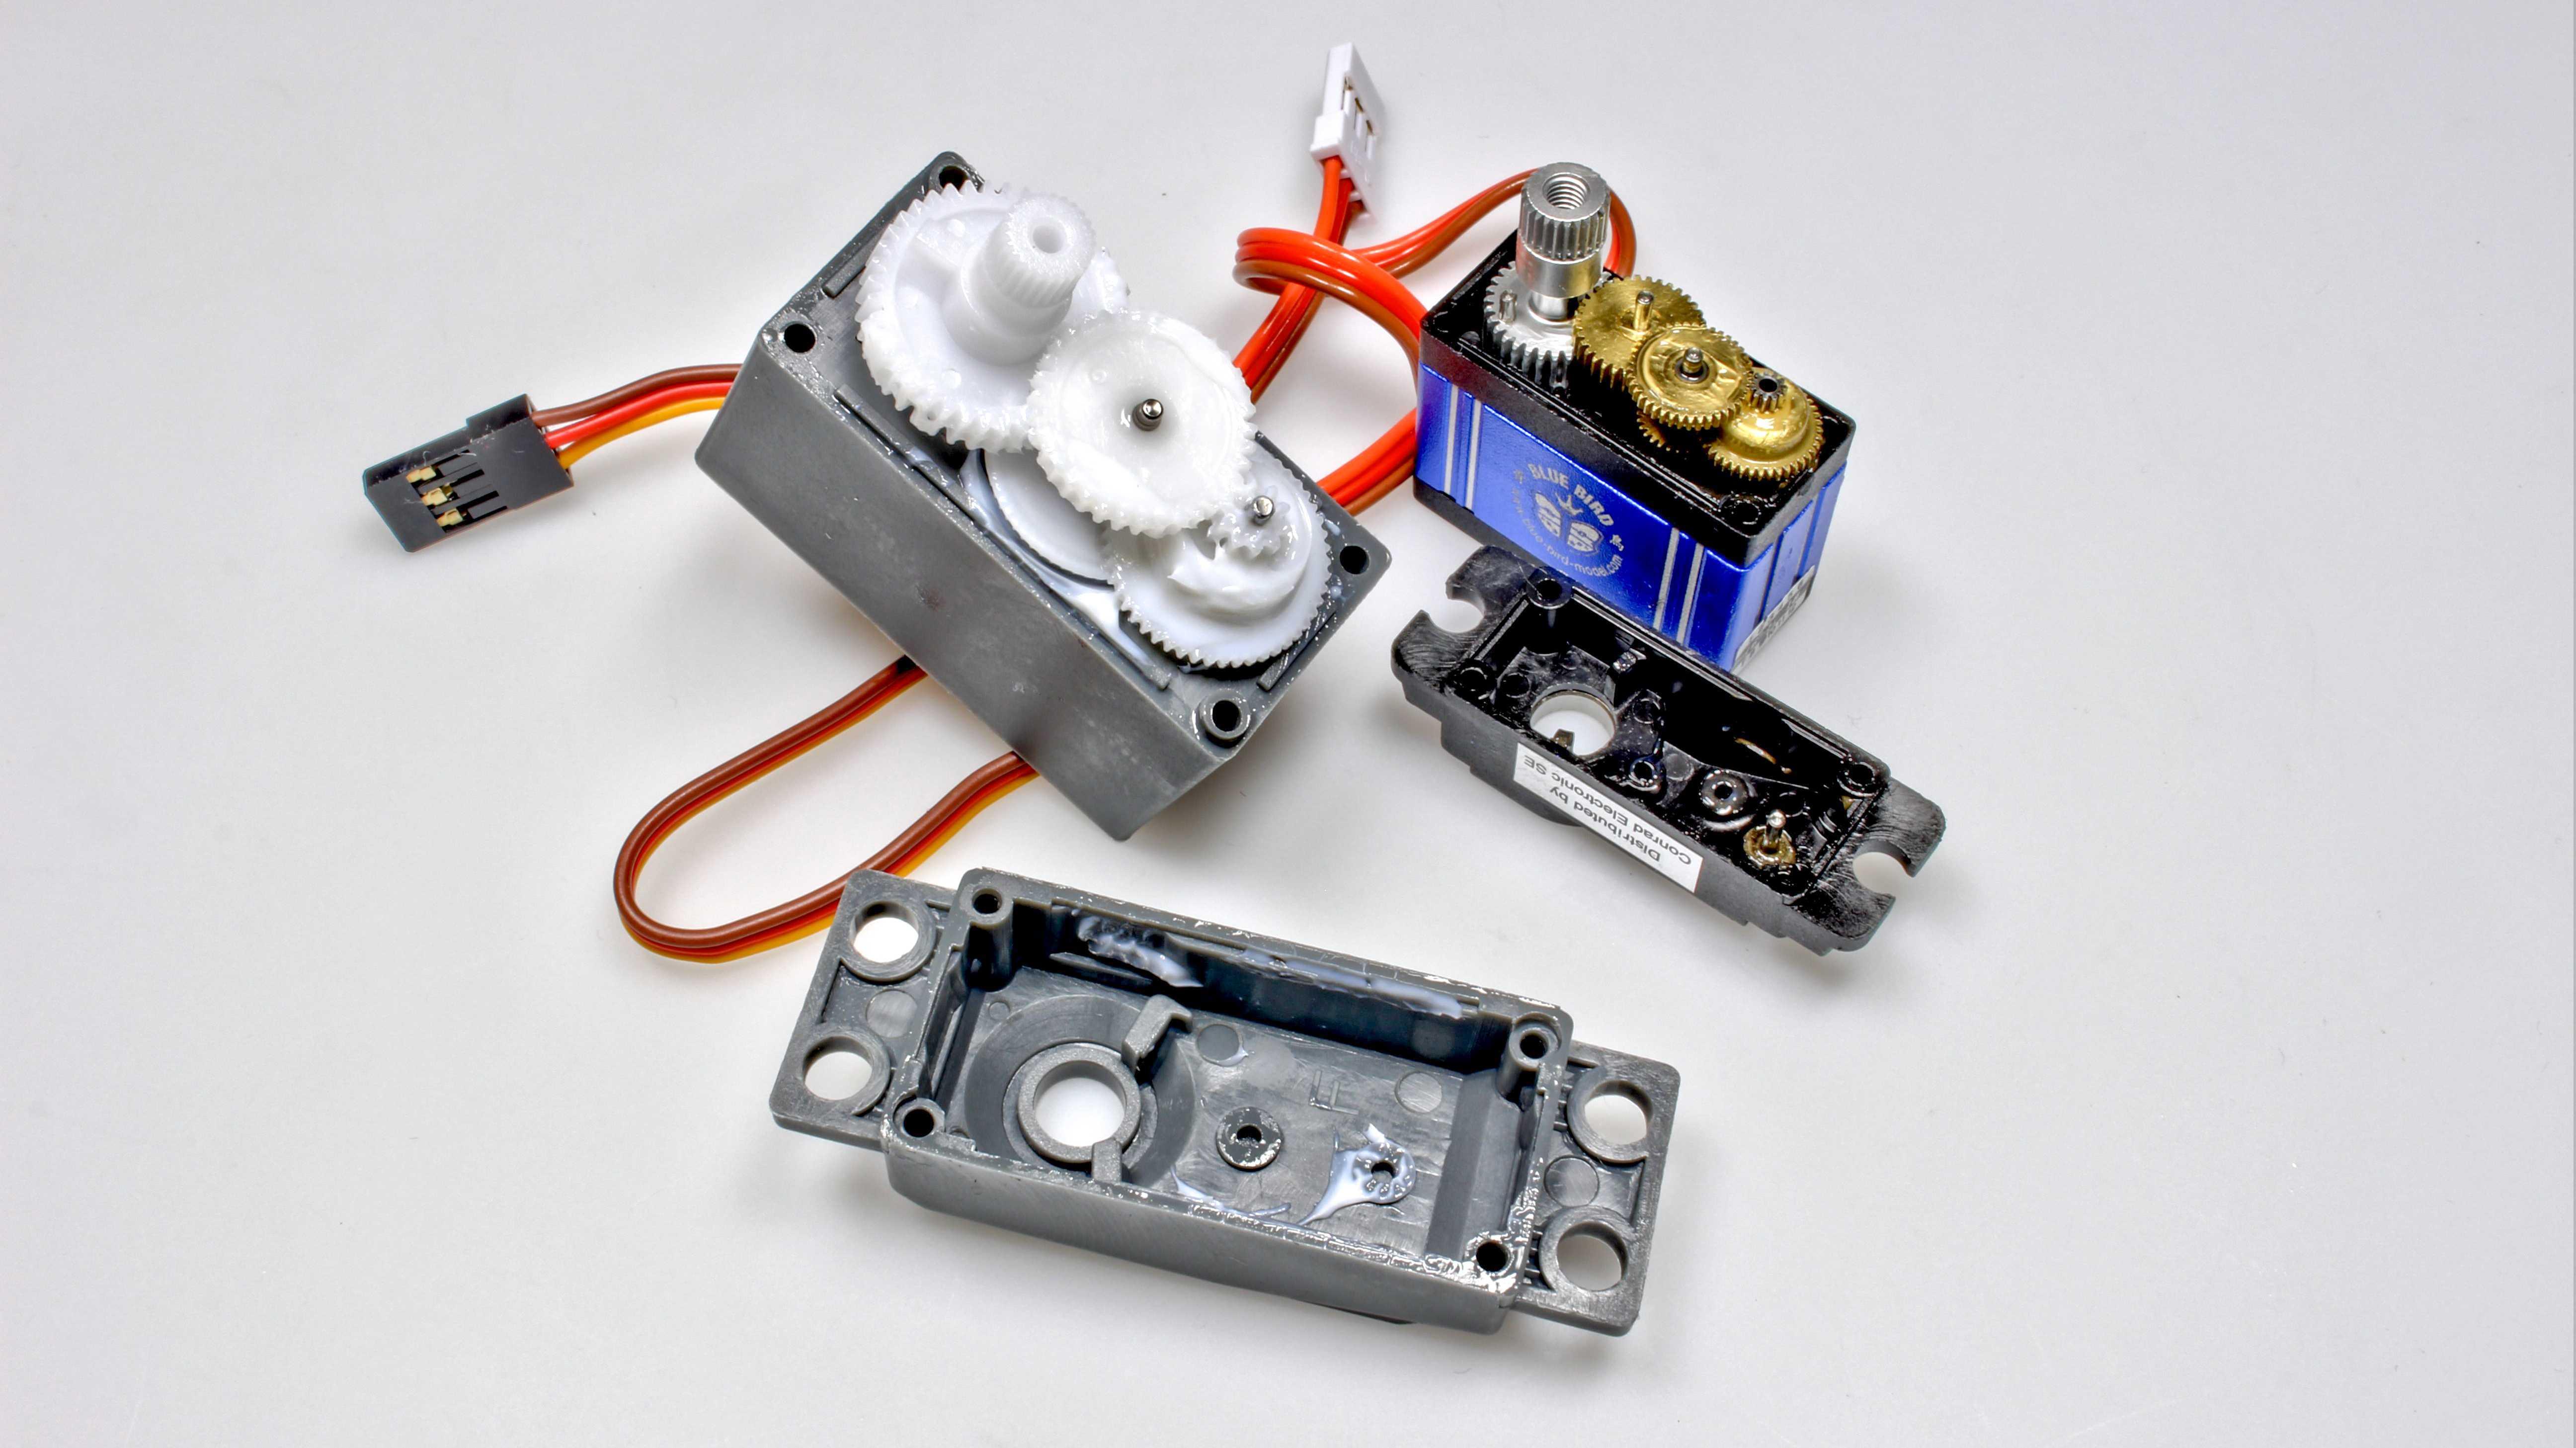 Aufbau eines Servomotors